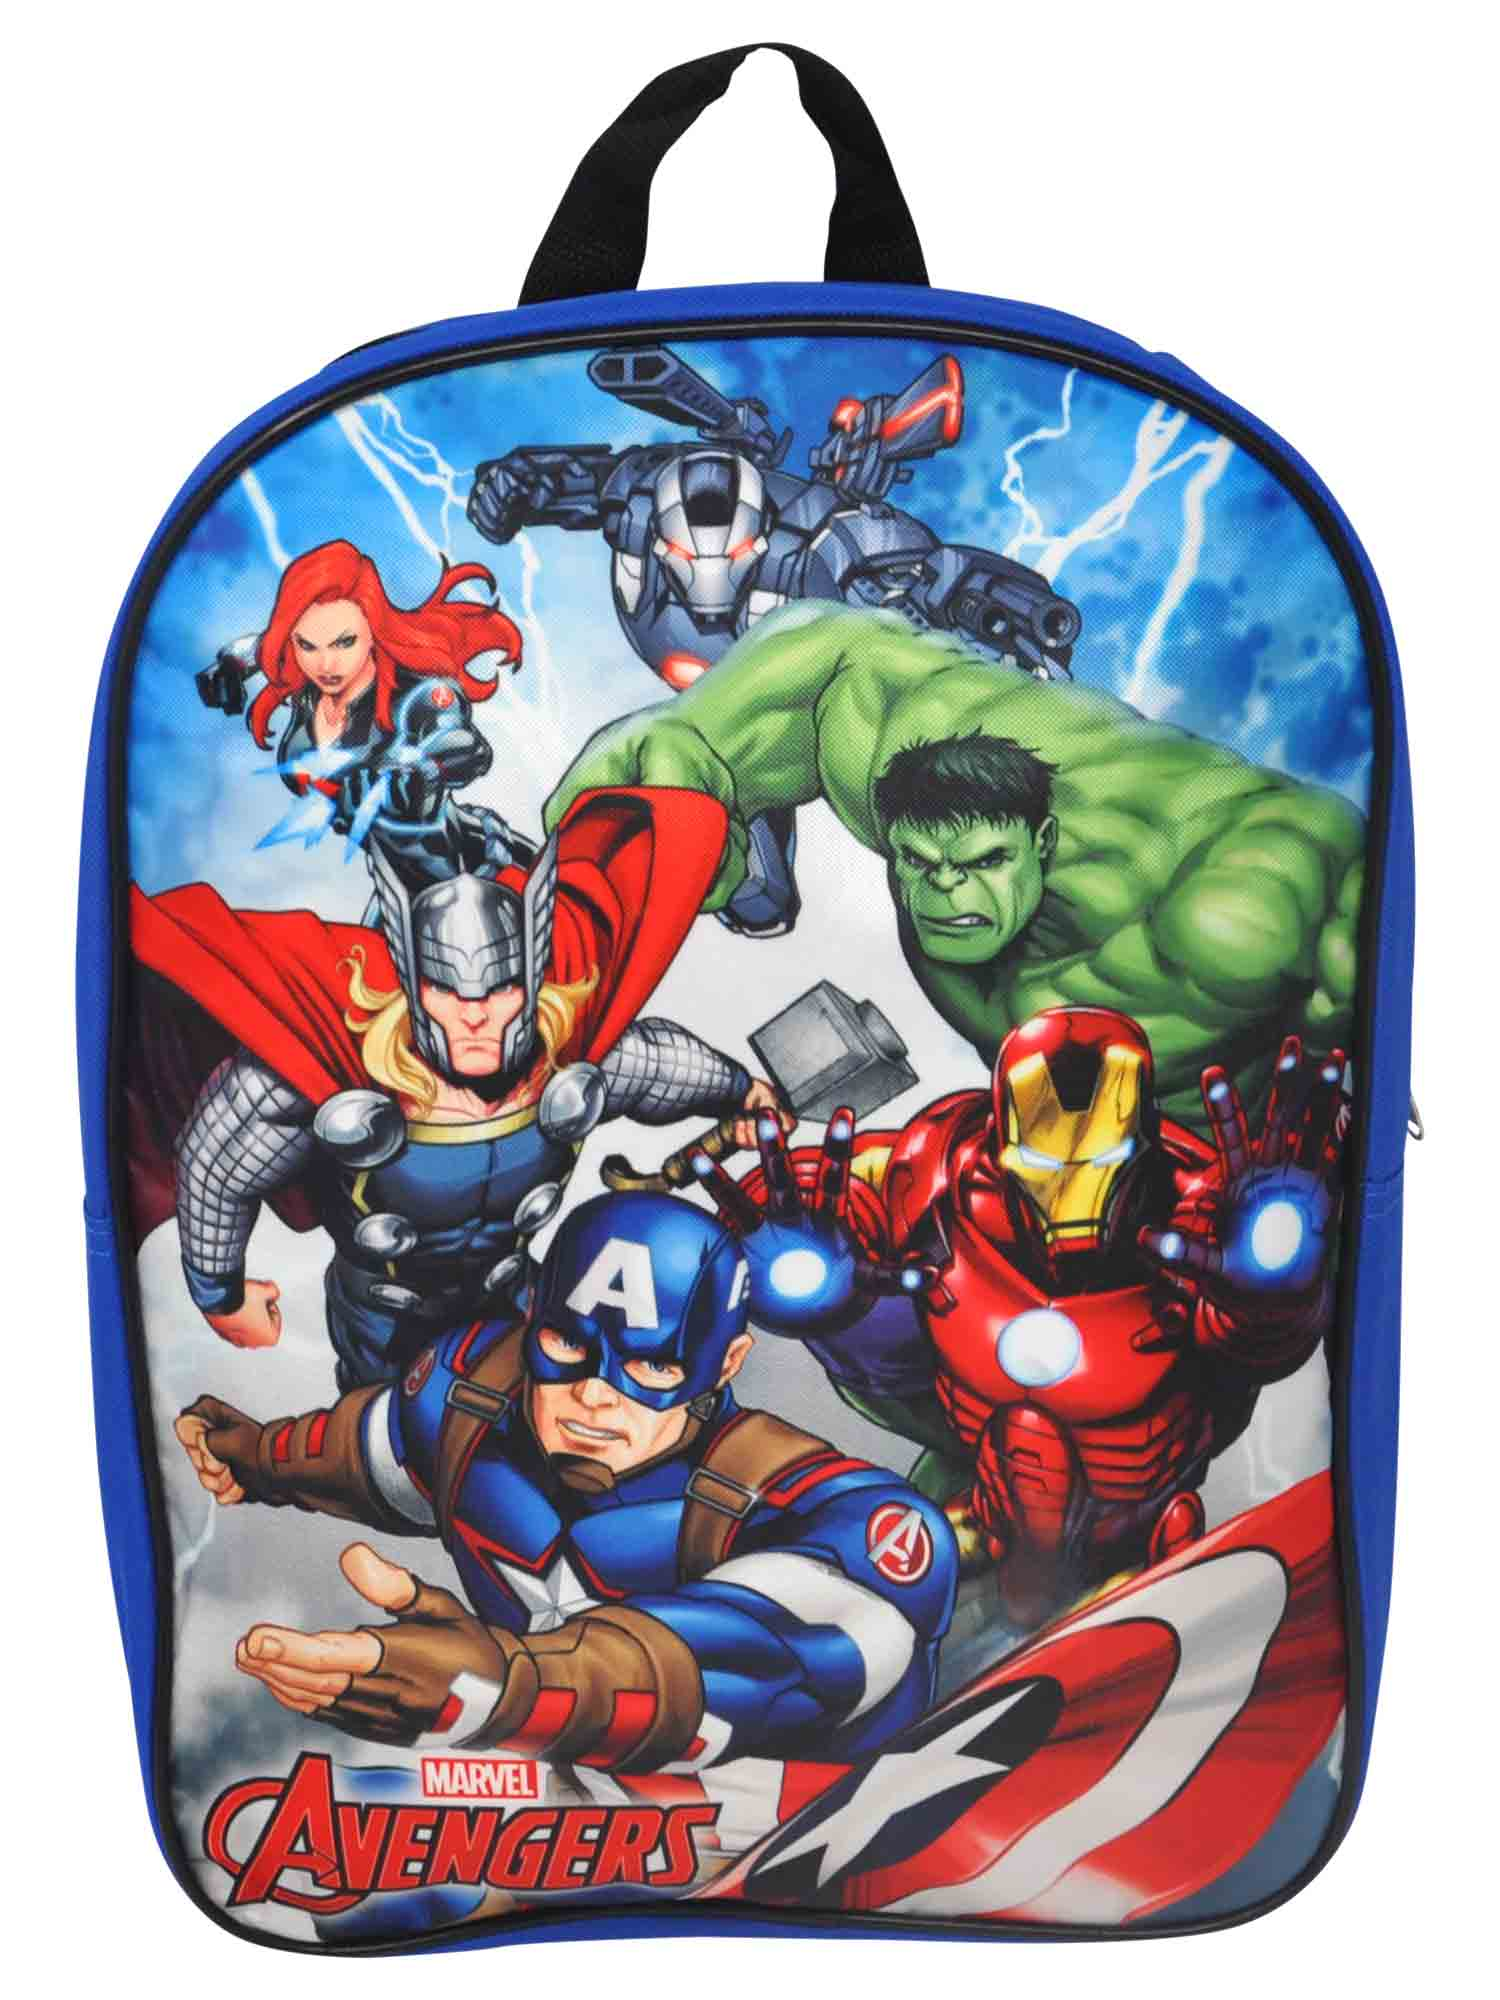 Marvel Avengers Official Backpack for Children Boys Girls Adults Comics Back Pac